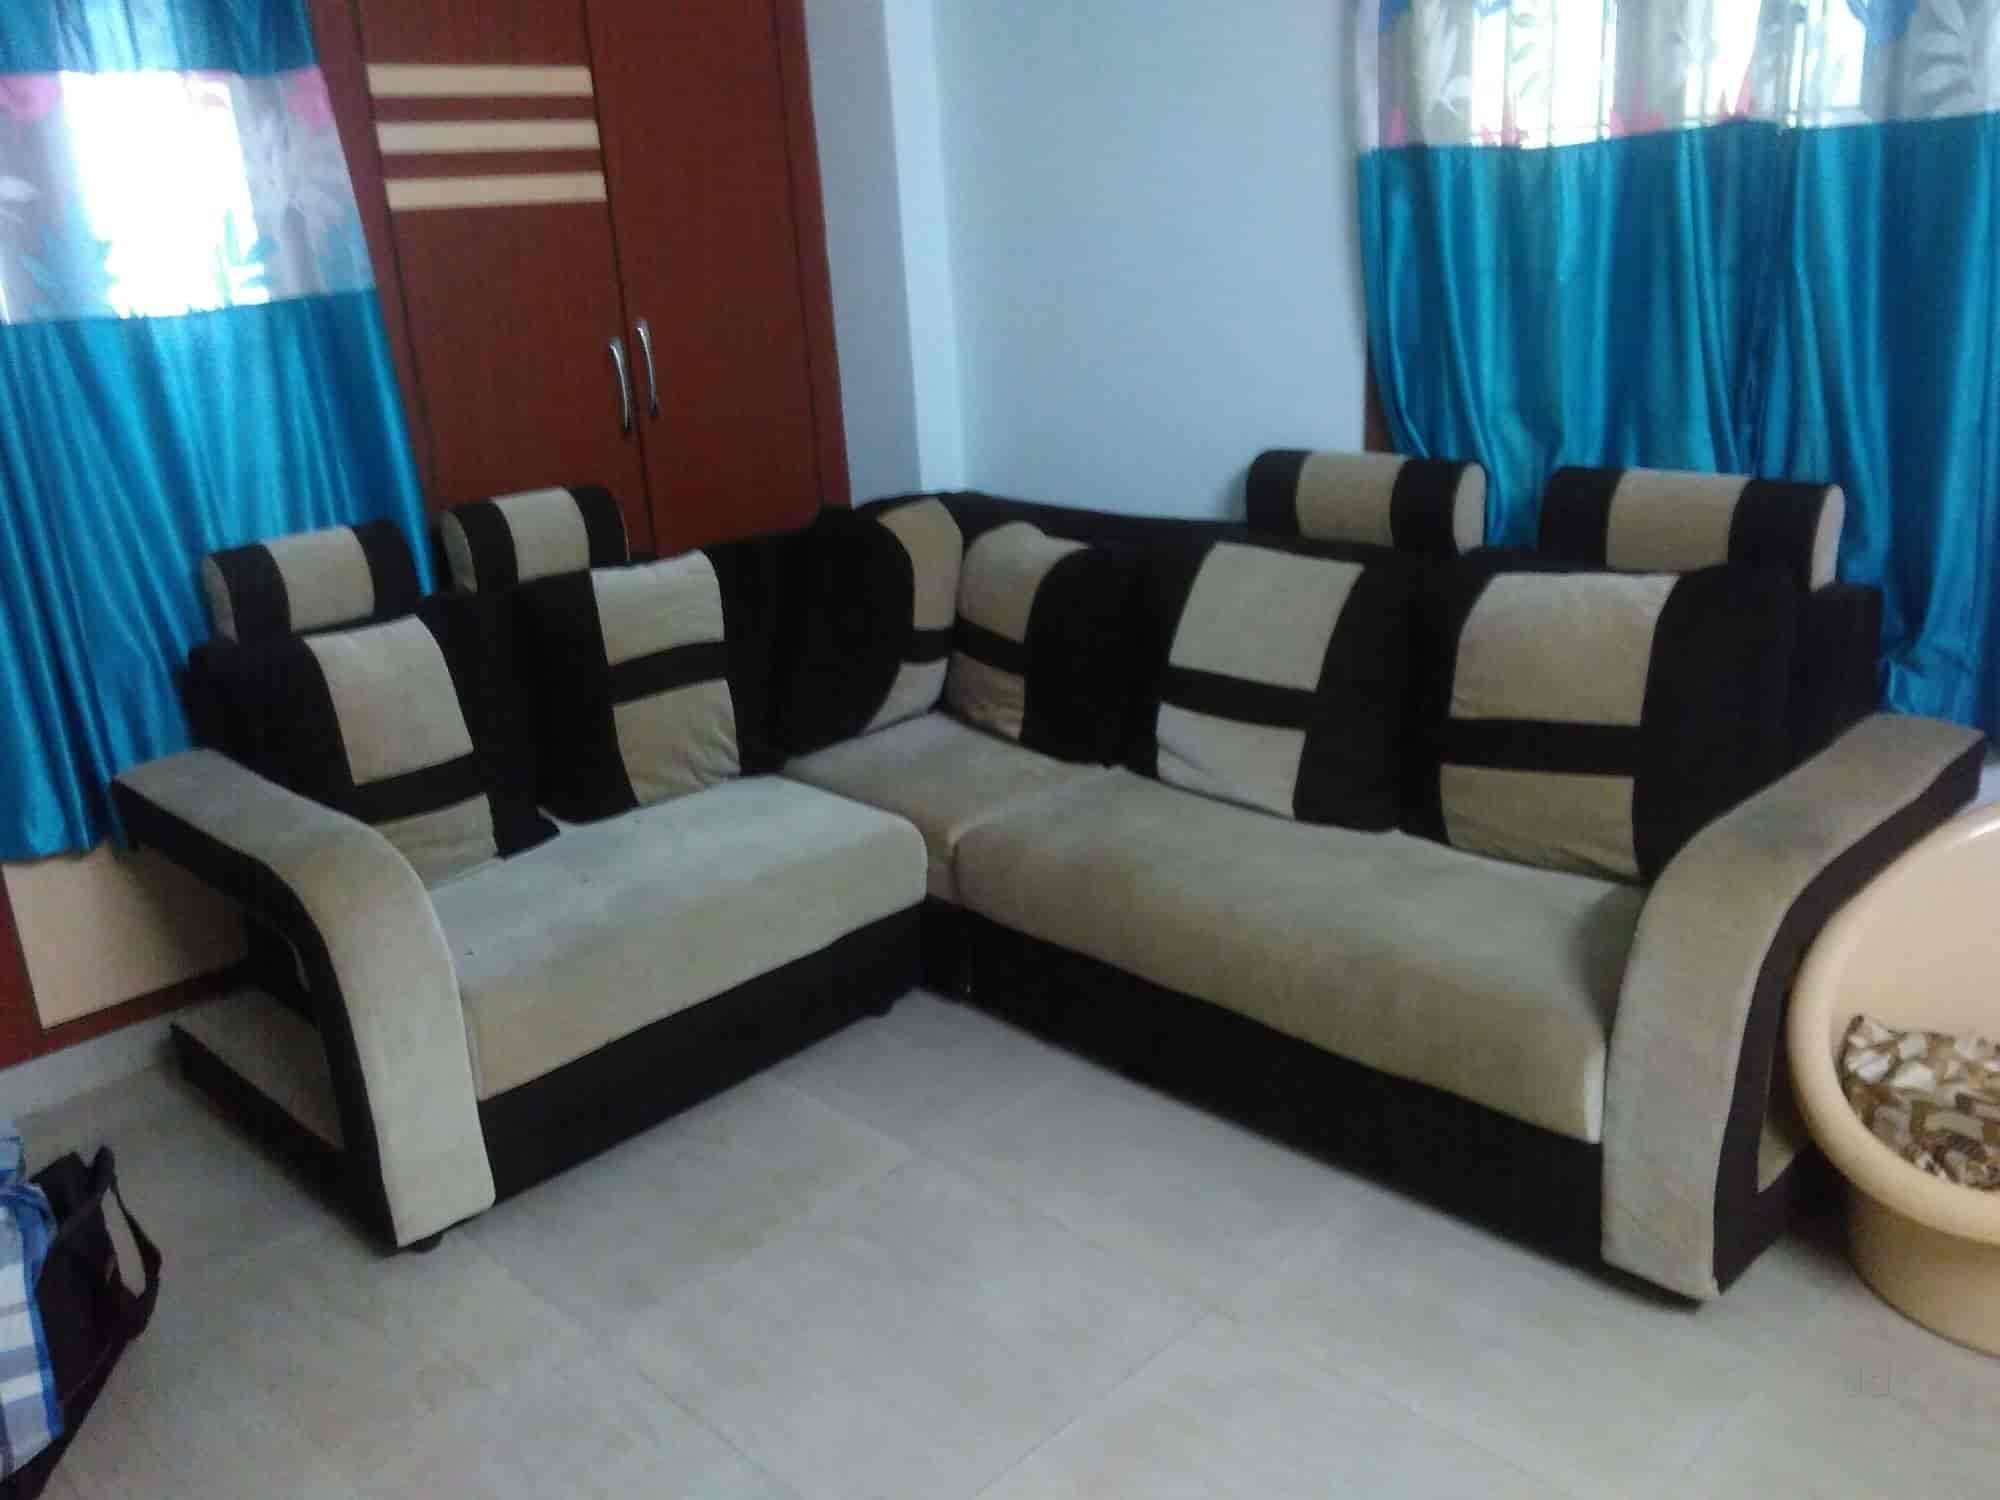 Admirable Super Star Sofa Bed Works Hs Darga Shaikpet Second Hand Uwap Interior Chair Design Uwaporg